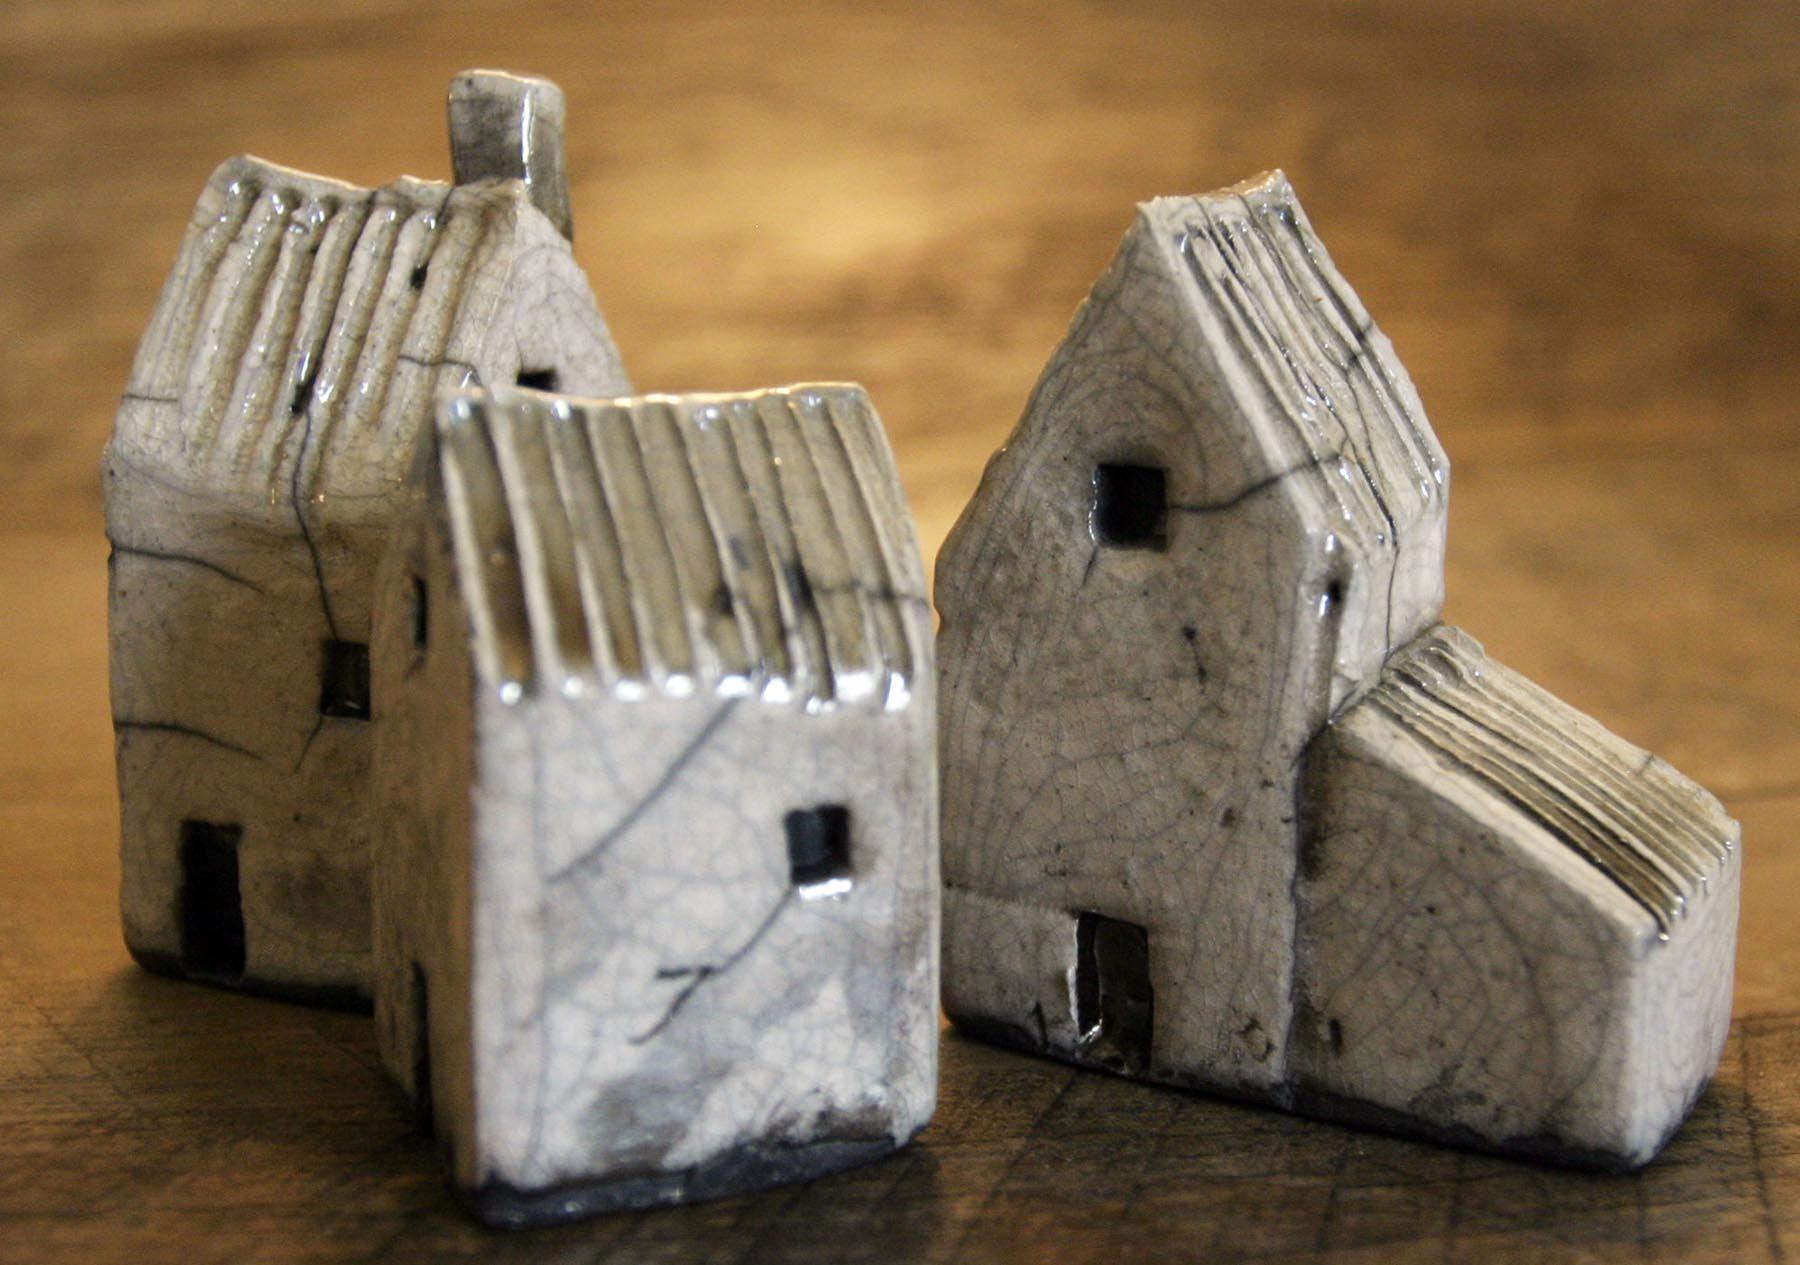 Small Raku Houses, Mark Strayer, North Star Pottery